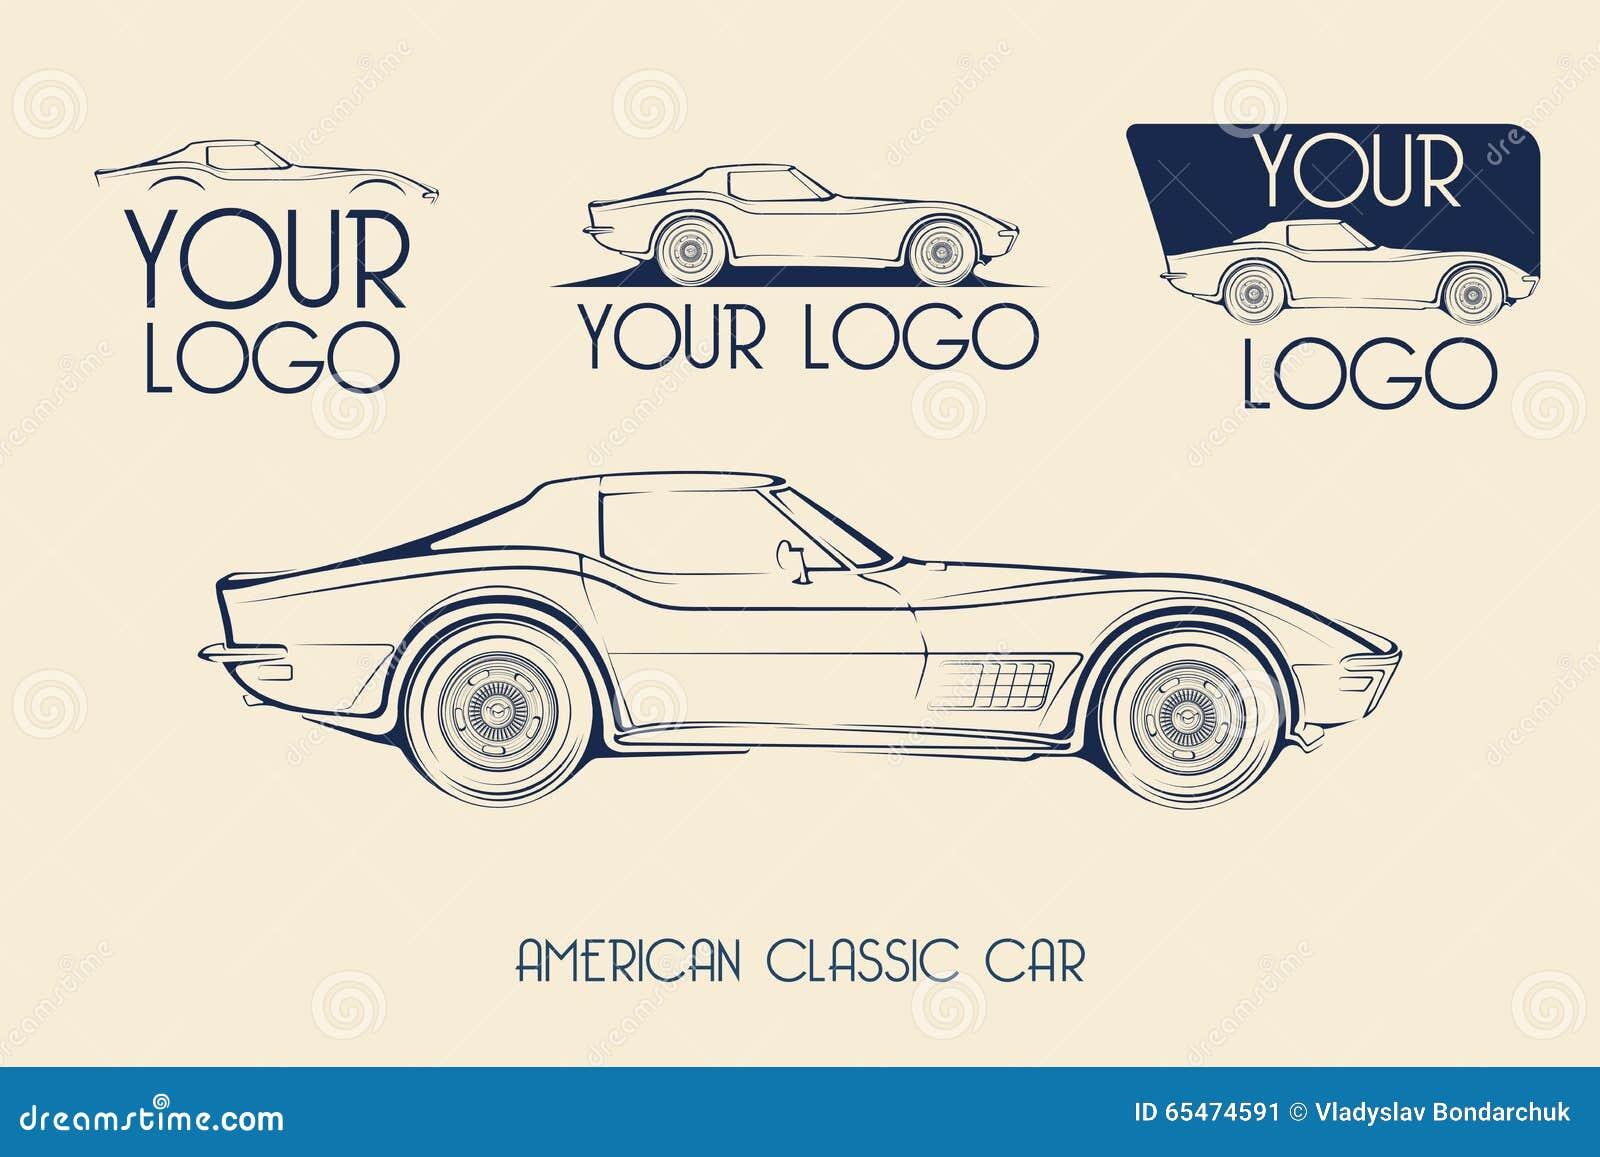 American classic sports car silhouettes logo stock for American classic logo